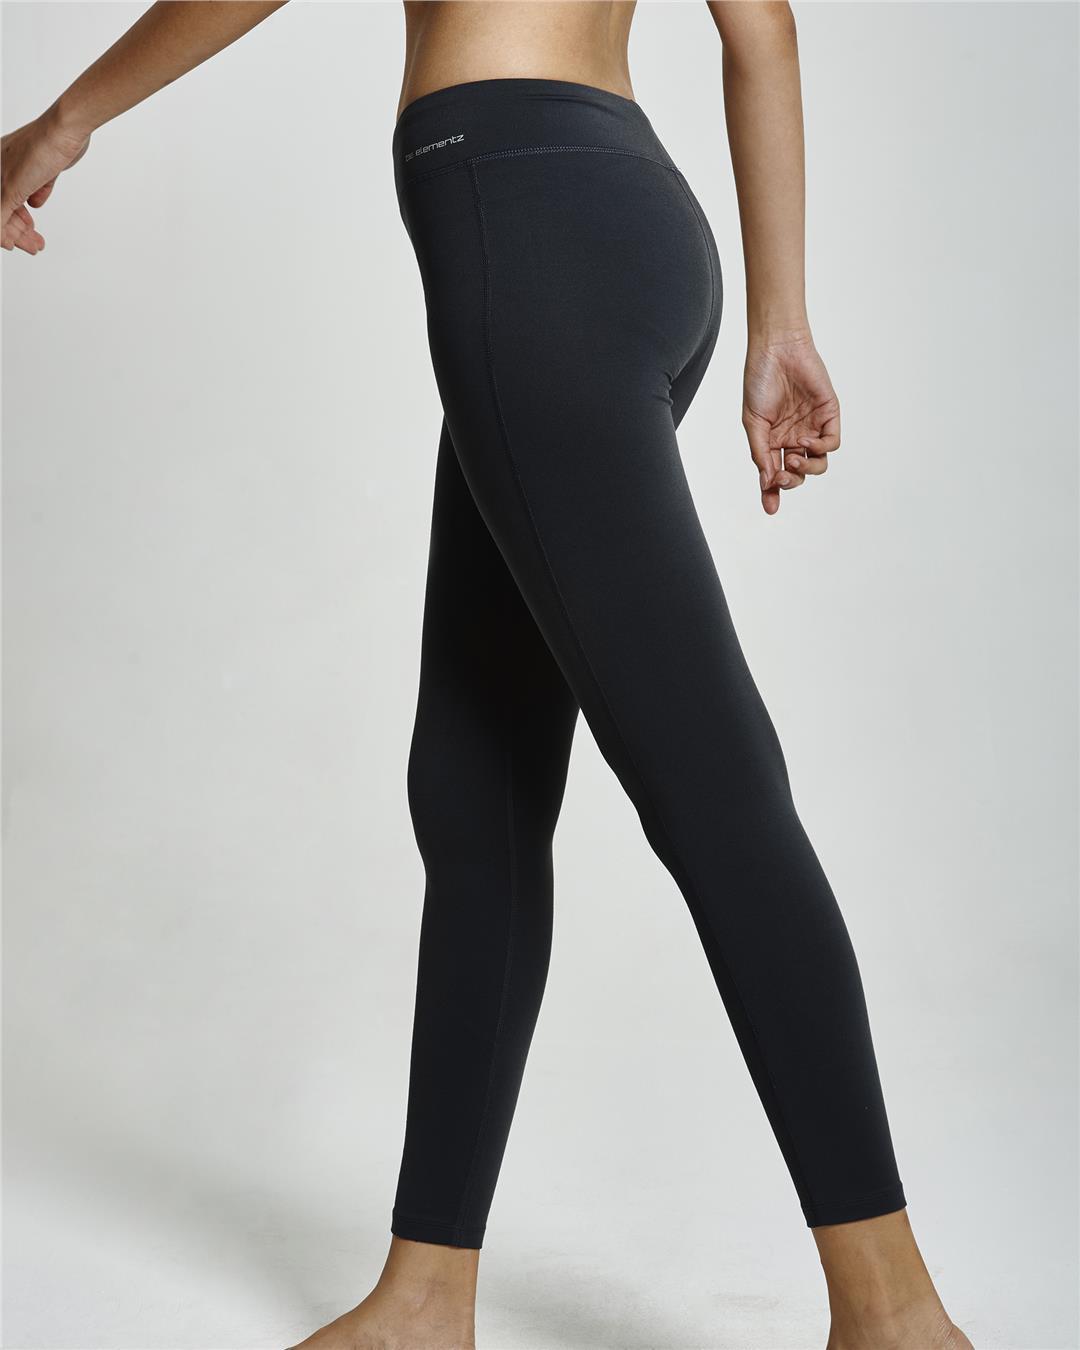 2a92e8dc47bc06 Breath Lifted Yoga Pants (Dark Grey) (end 6/15/2020 4:15 PM)